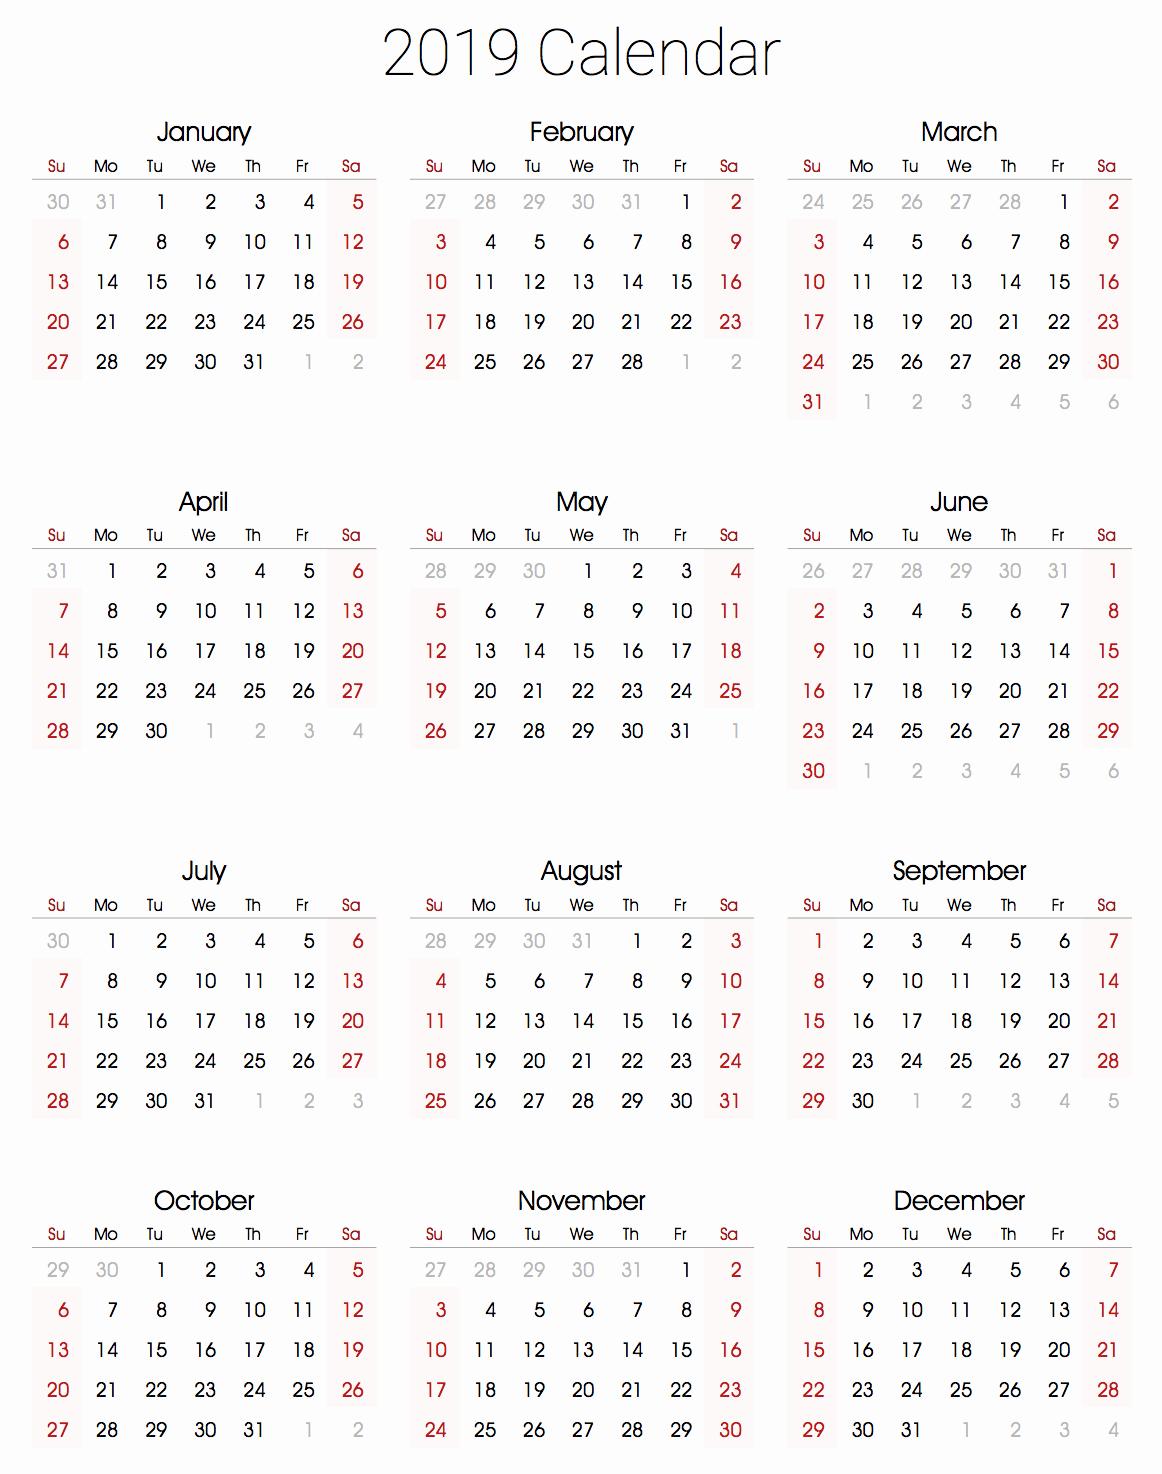 Free Printable 2019 Yearly Calendar Elegant 2019 Calendar Amazonaws